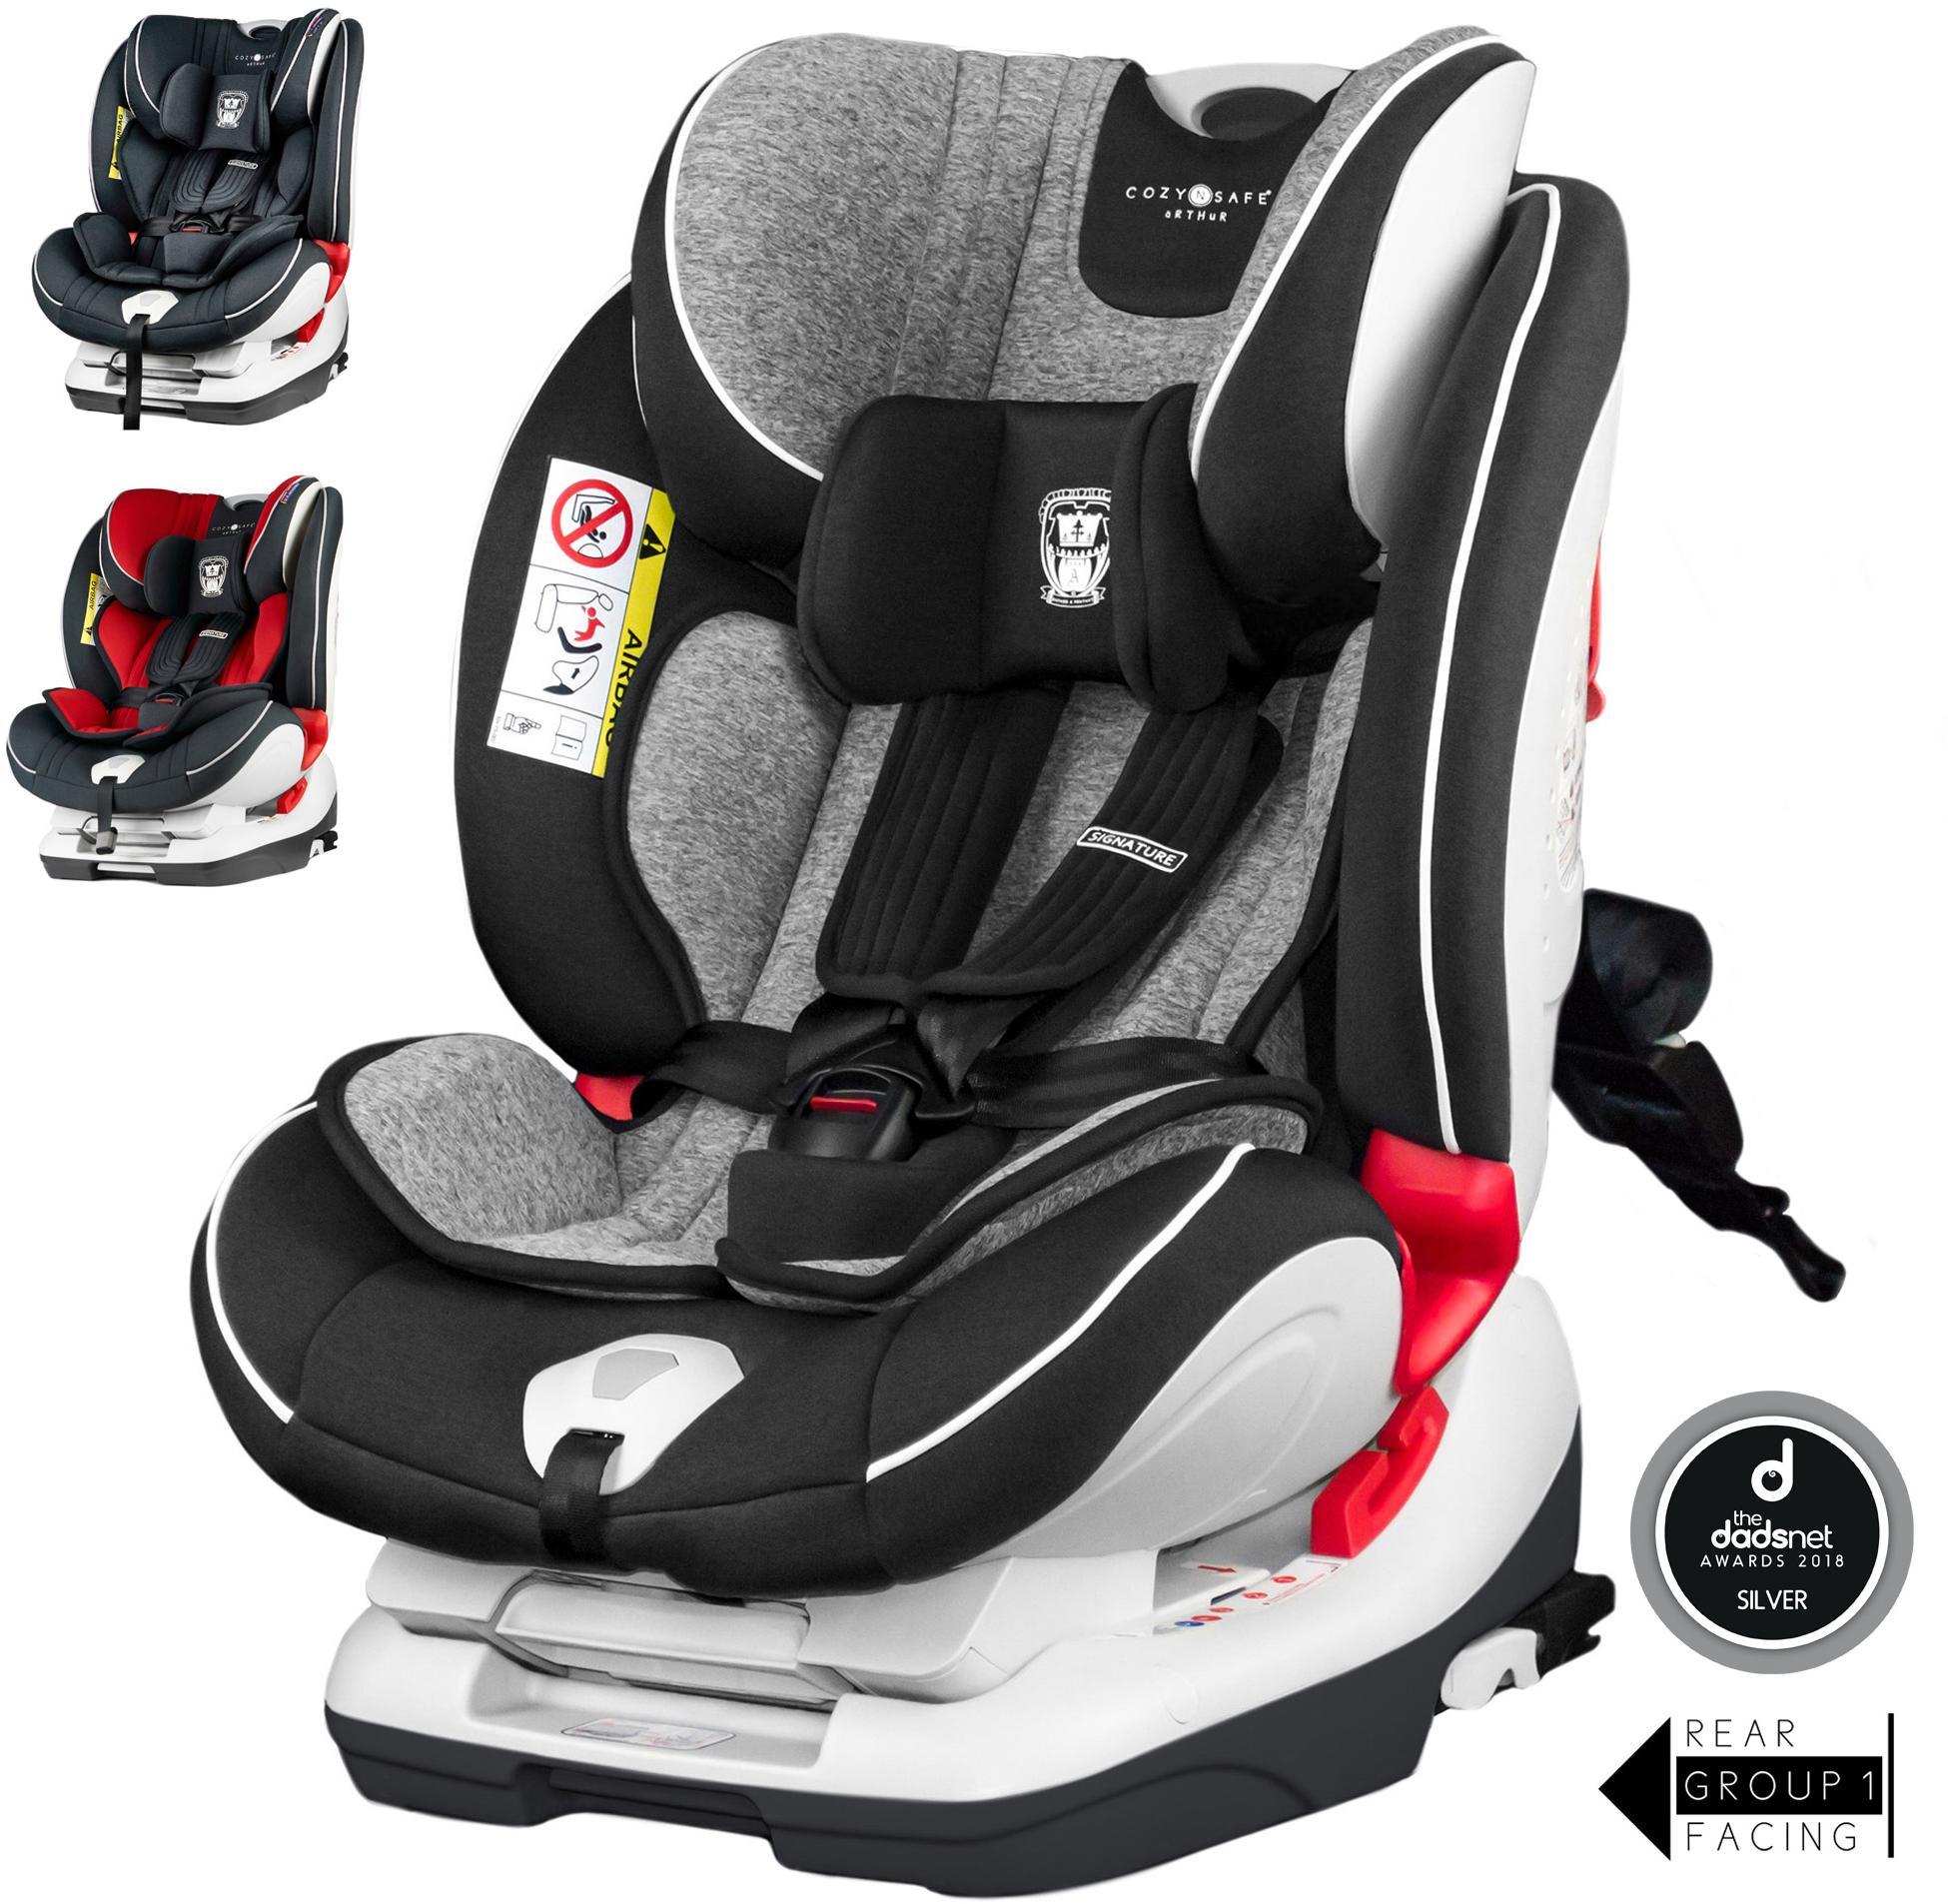 Cozy N Safe Arthur Group 0+/1/2/3 Child Car Seat - Graphite